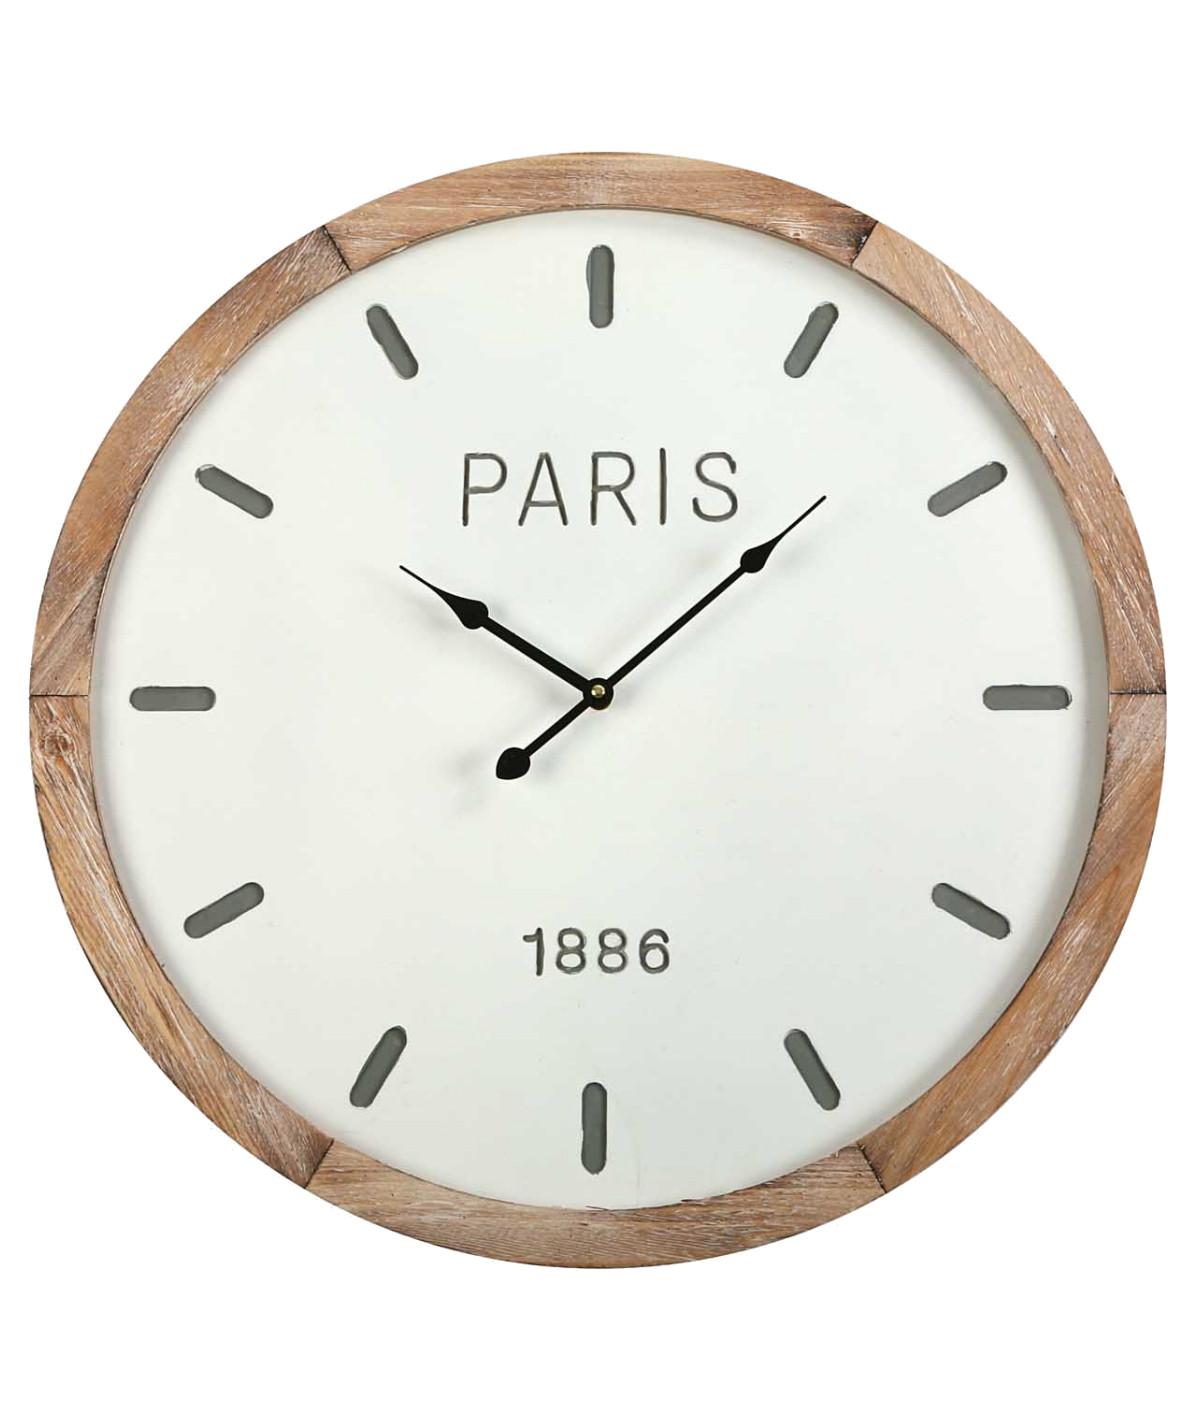 Horloge murale bois style scandinave Diam60cm - Horloge murale | Yesdeko